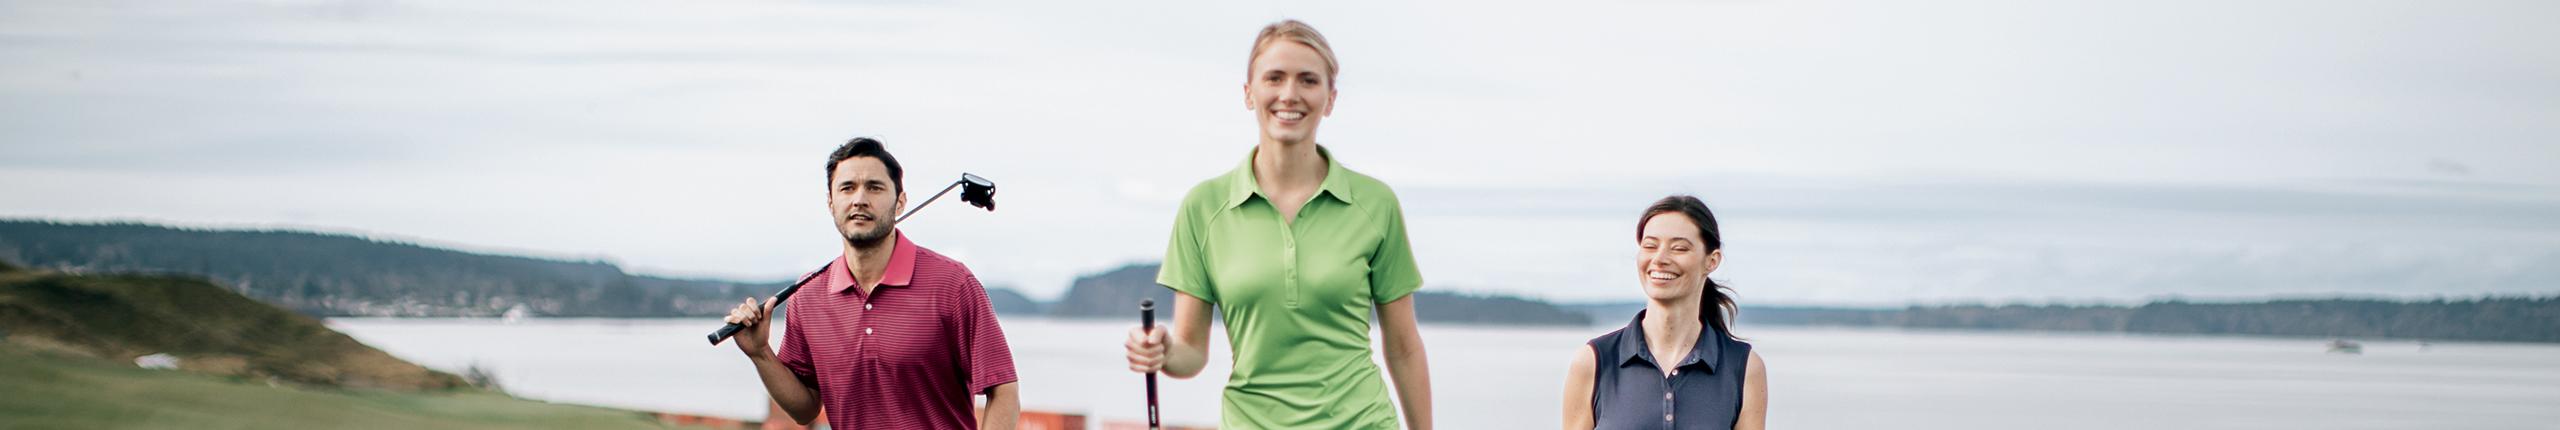 Woman wearing womens golf clothes, women's golf apparel.